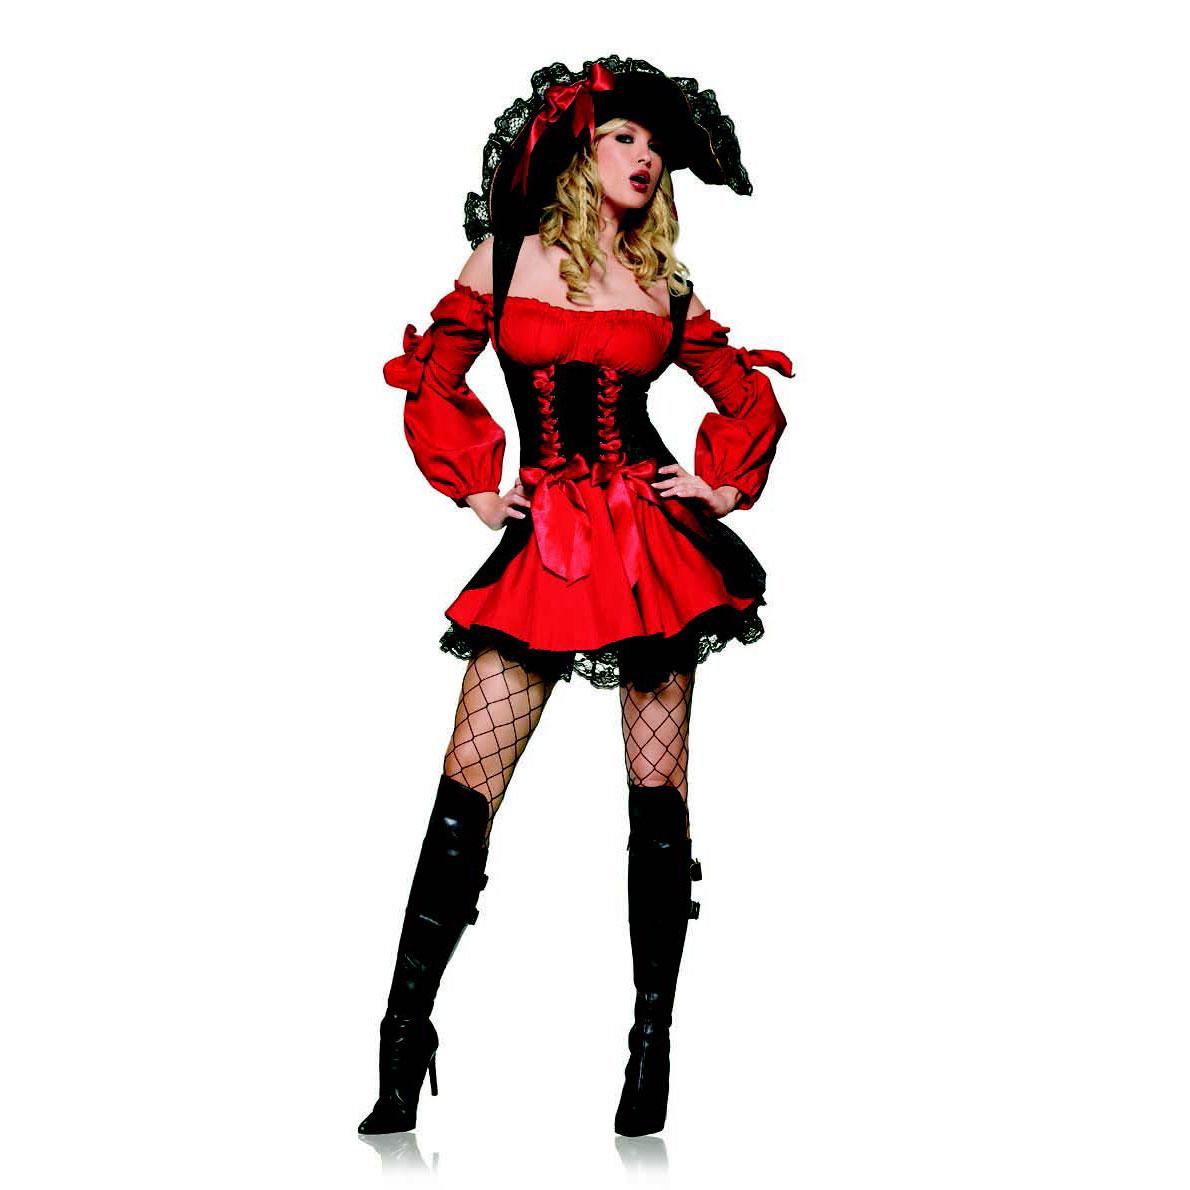 Ifavor123com Sexy Swashbuckler Vixen Pirate Wench Womens Adult Halloween Costume 2950